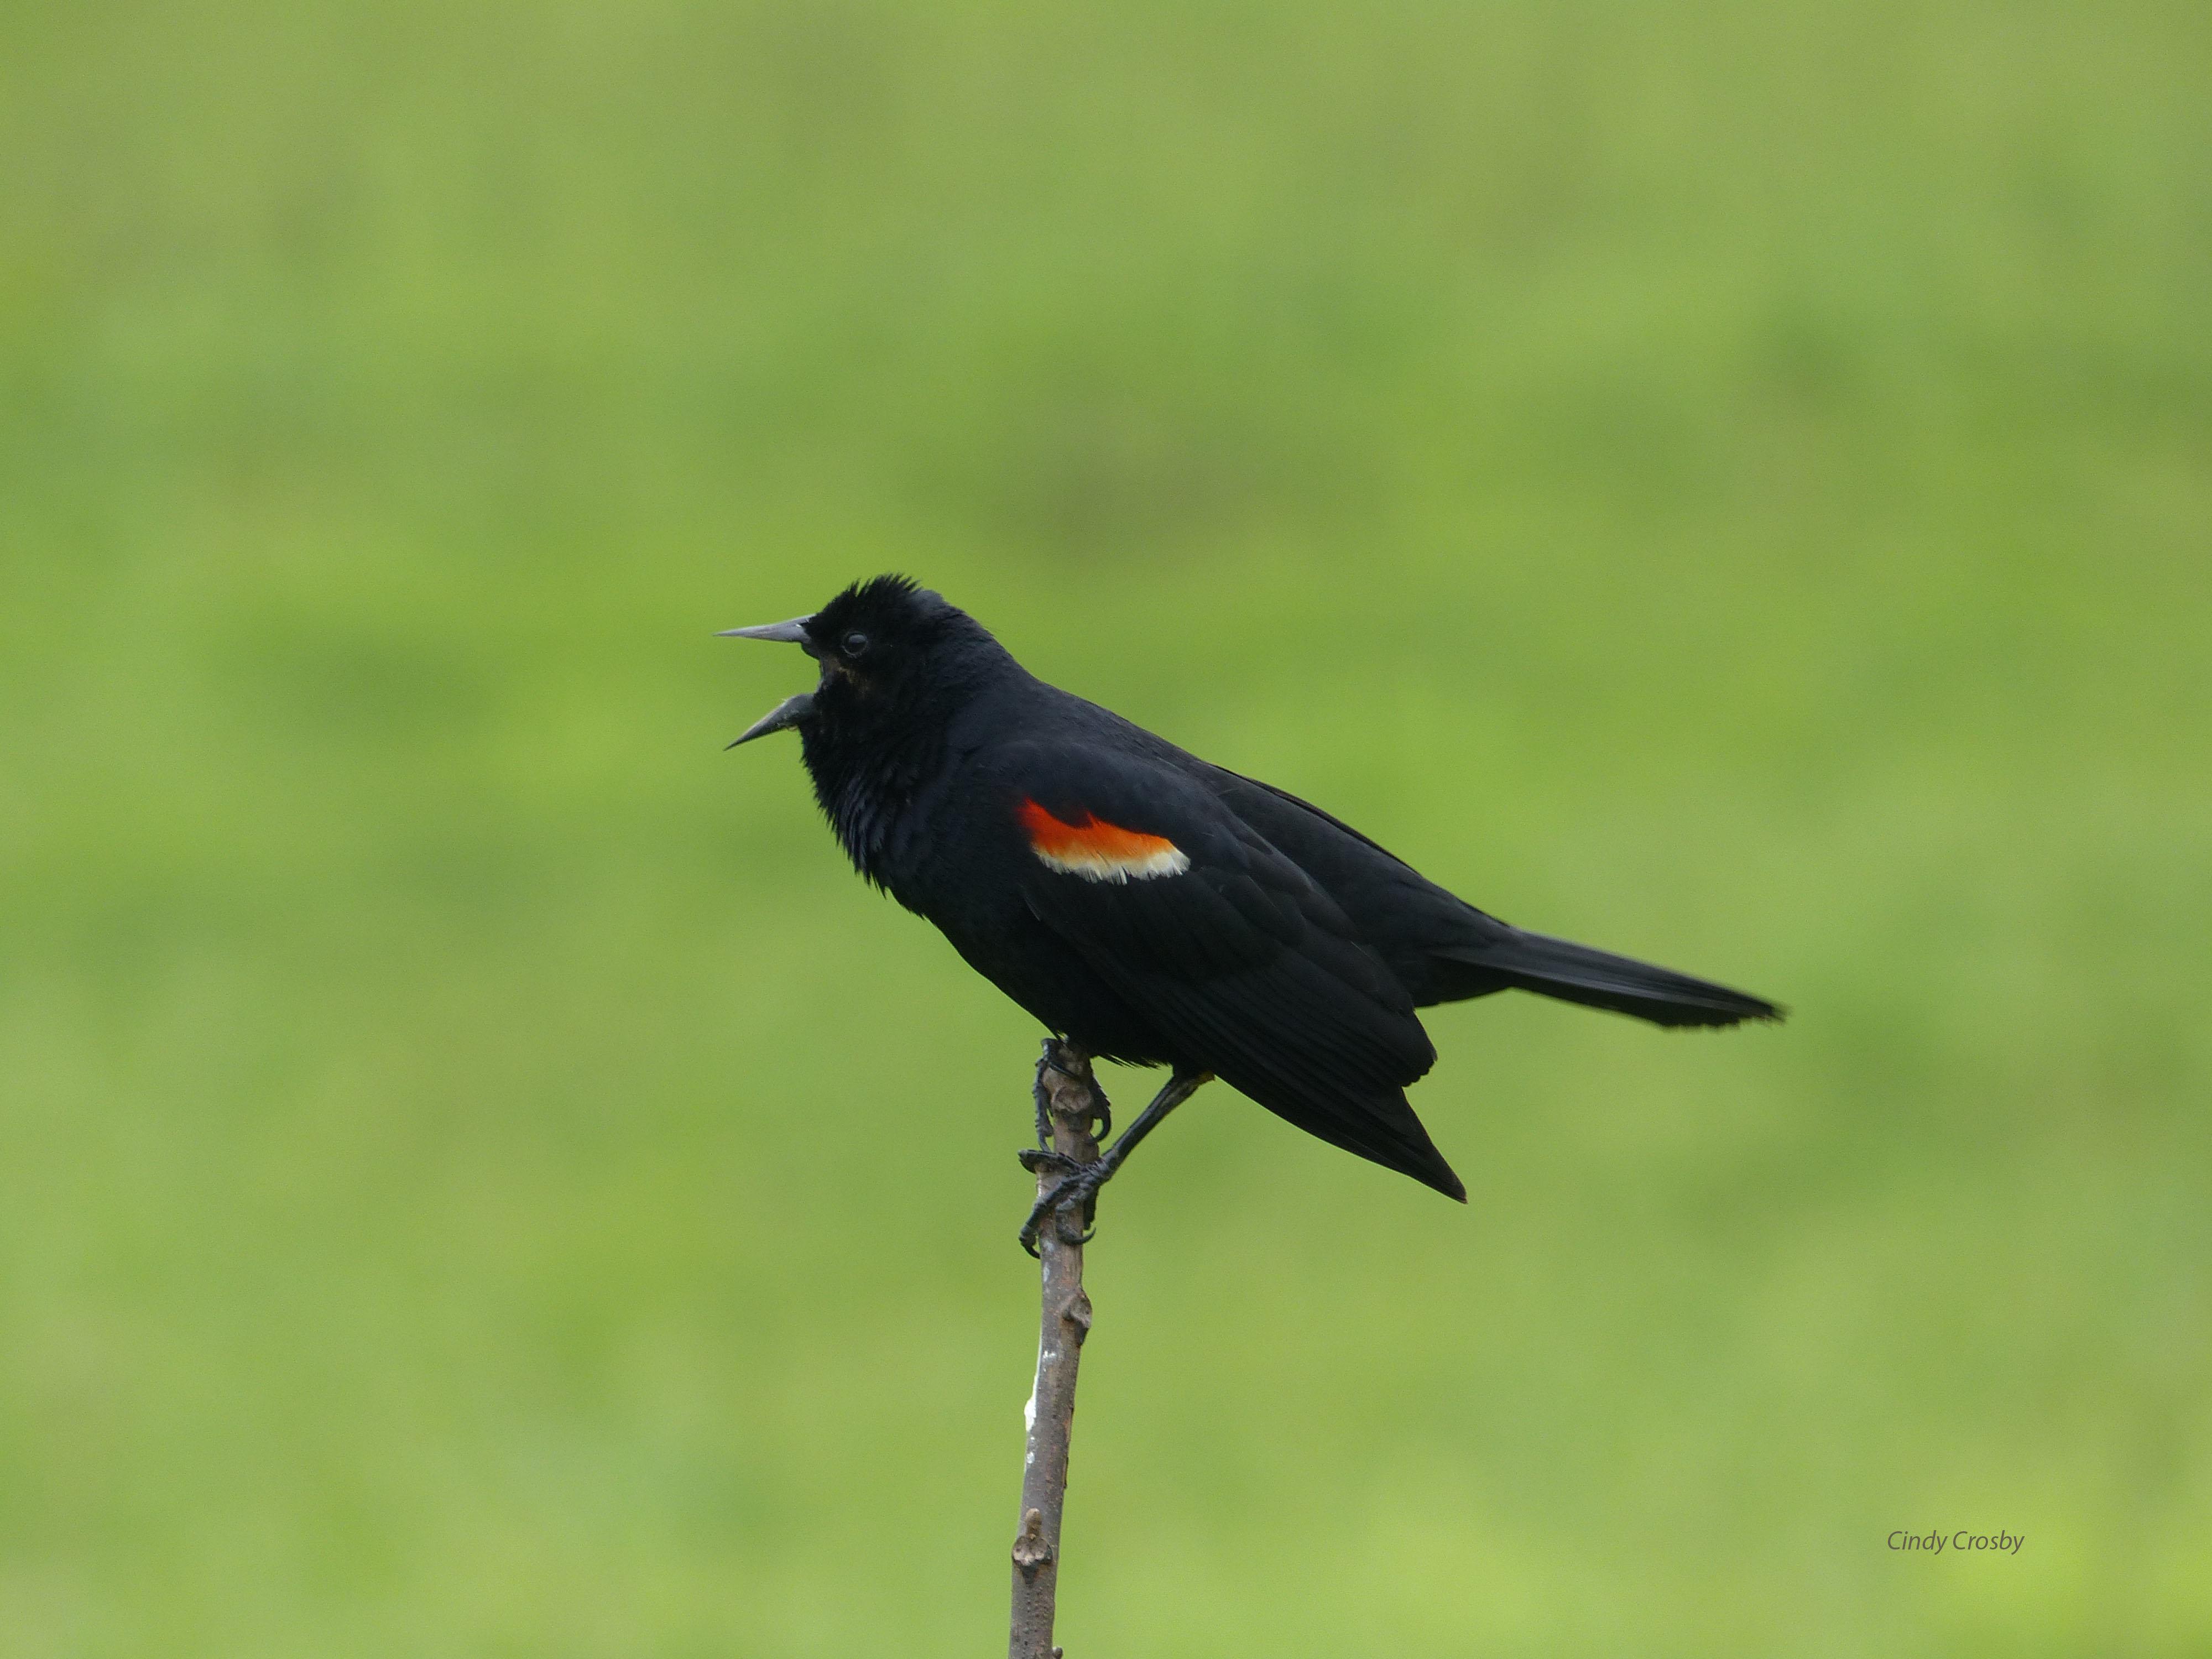 rewingblackbirdSPMA52218.jpg